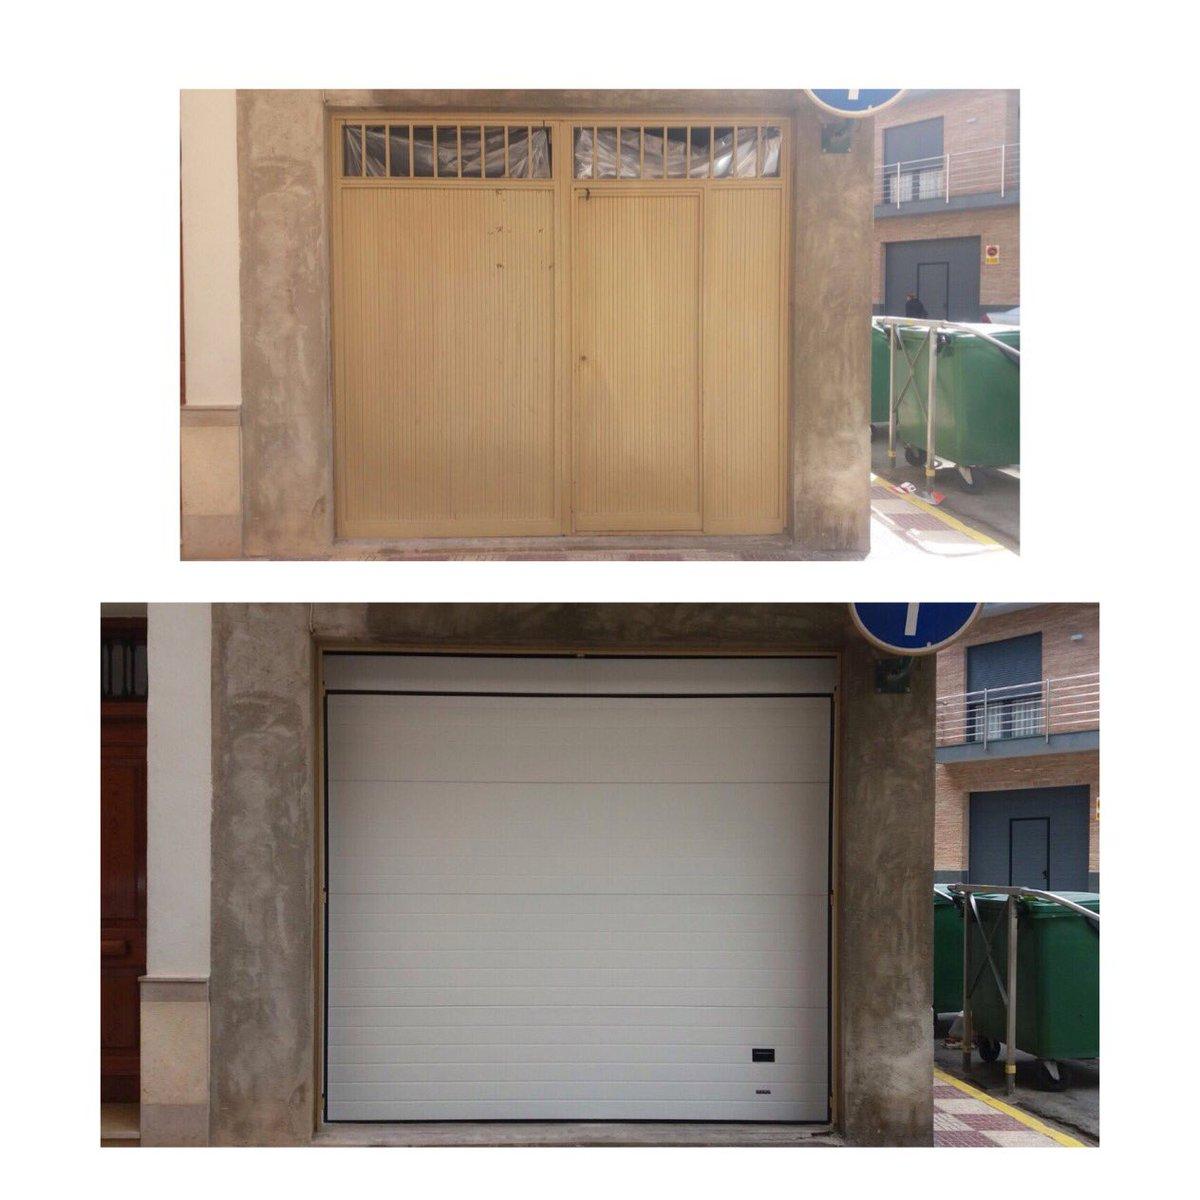 Puertas roper puertasroper twitter - Puertas roper ...